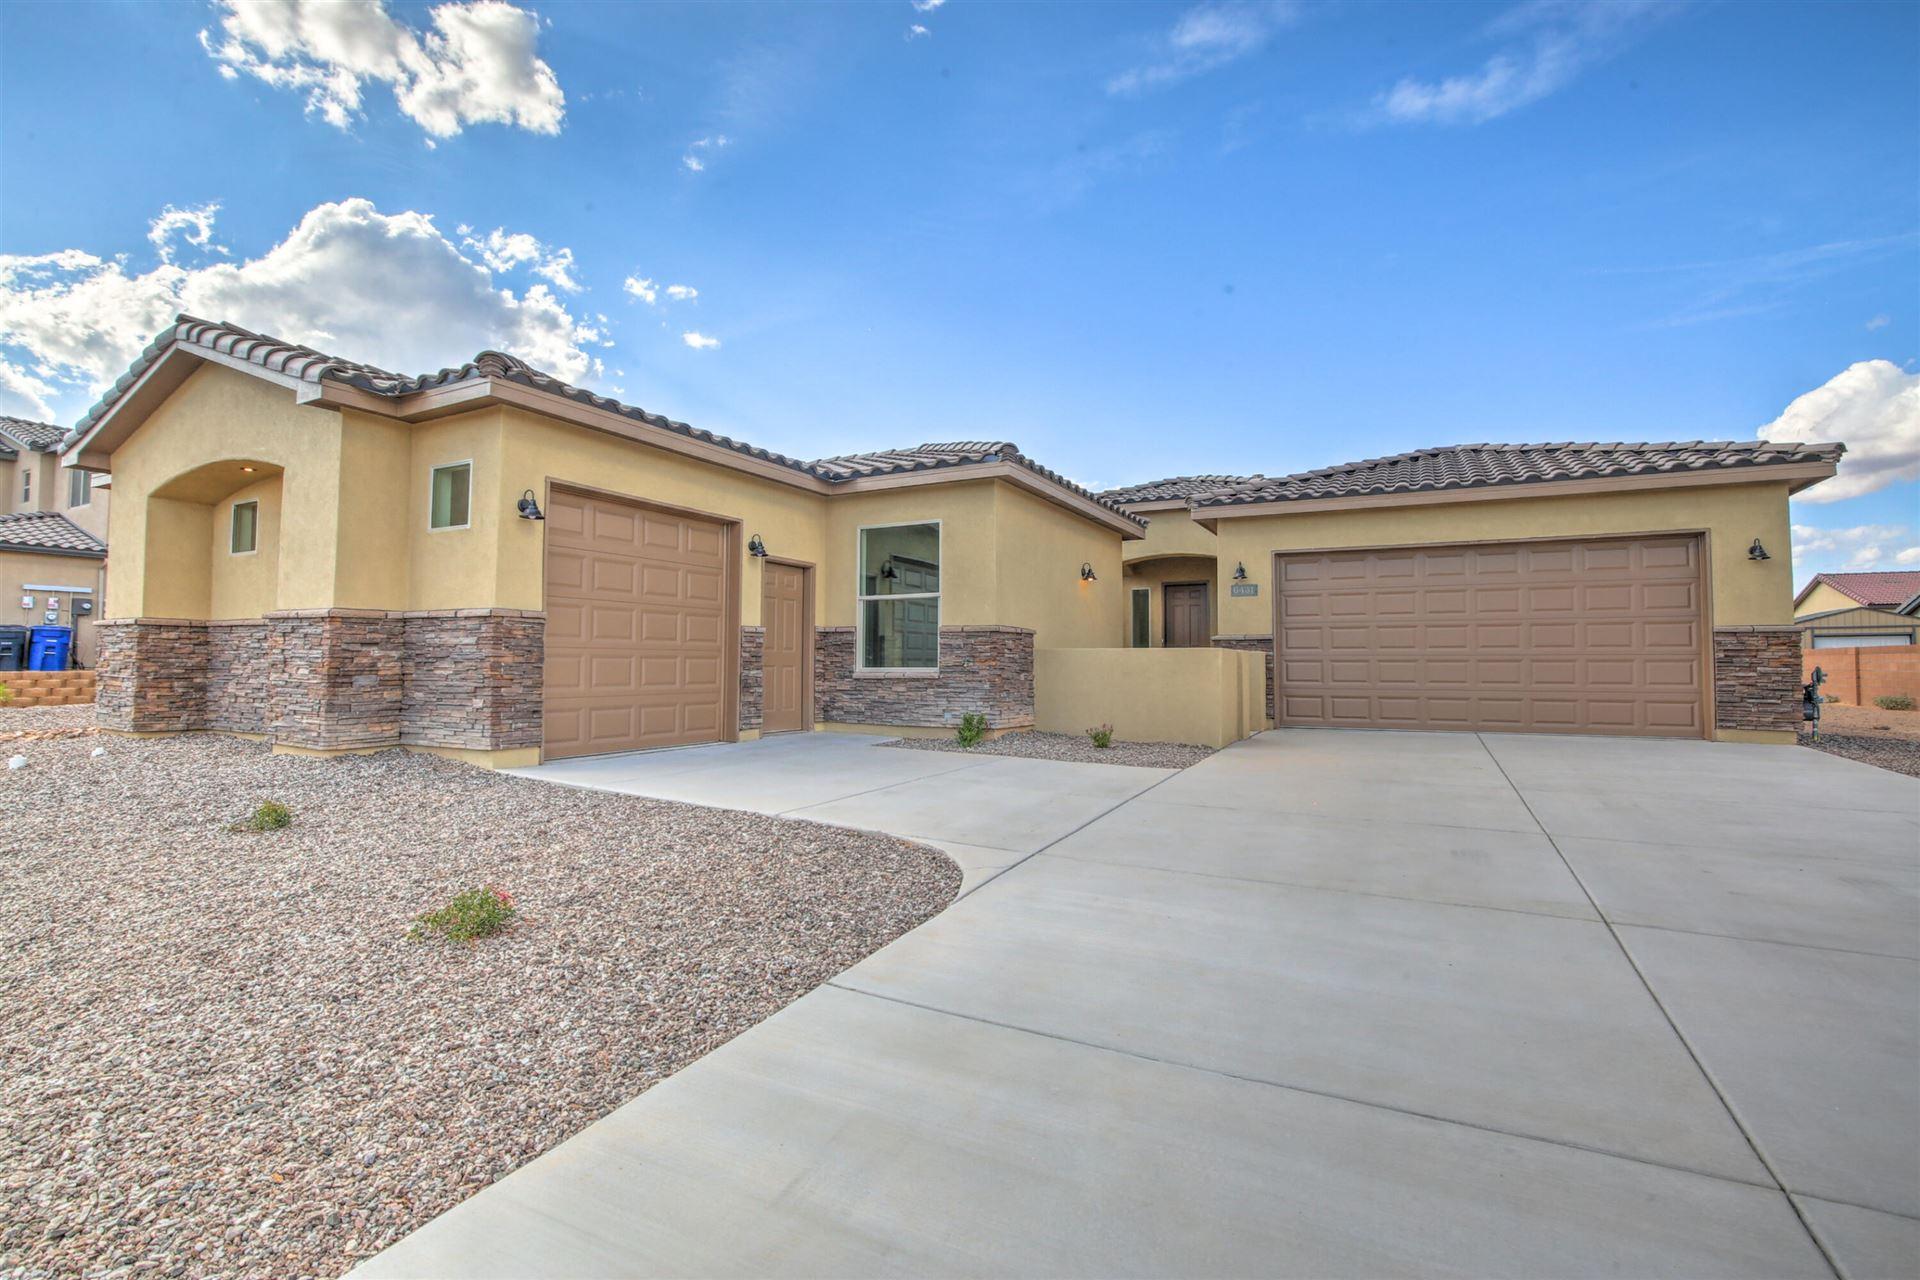 6431 PICARDIA Place NW, Albuquerque, NM 87120 - MLS#: 993887